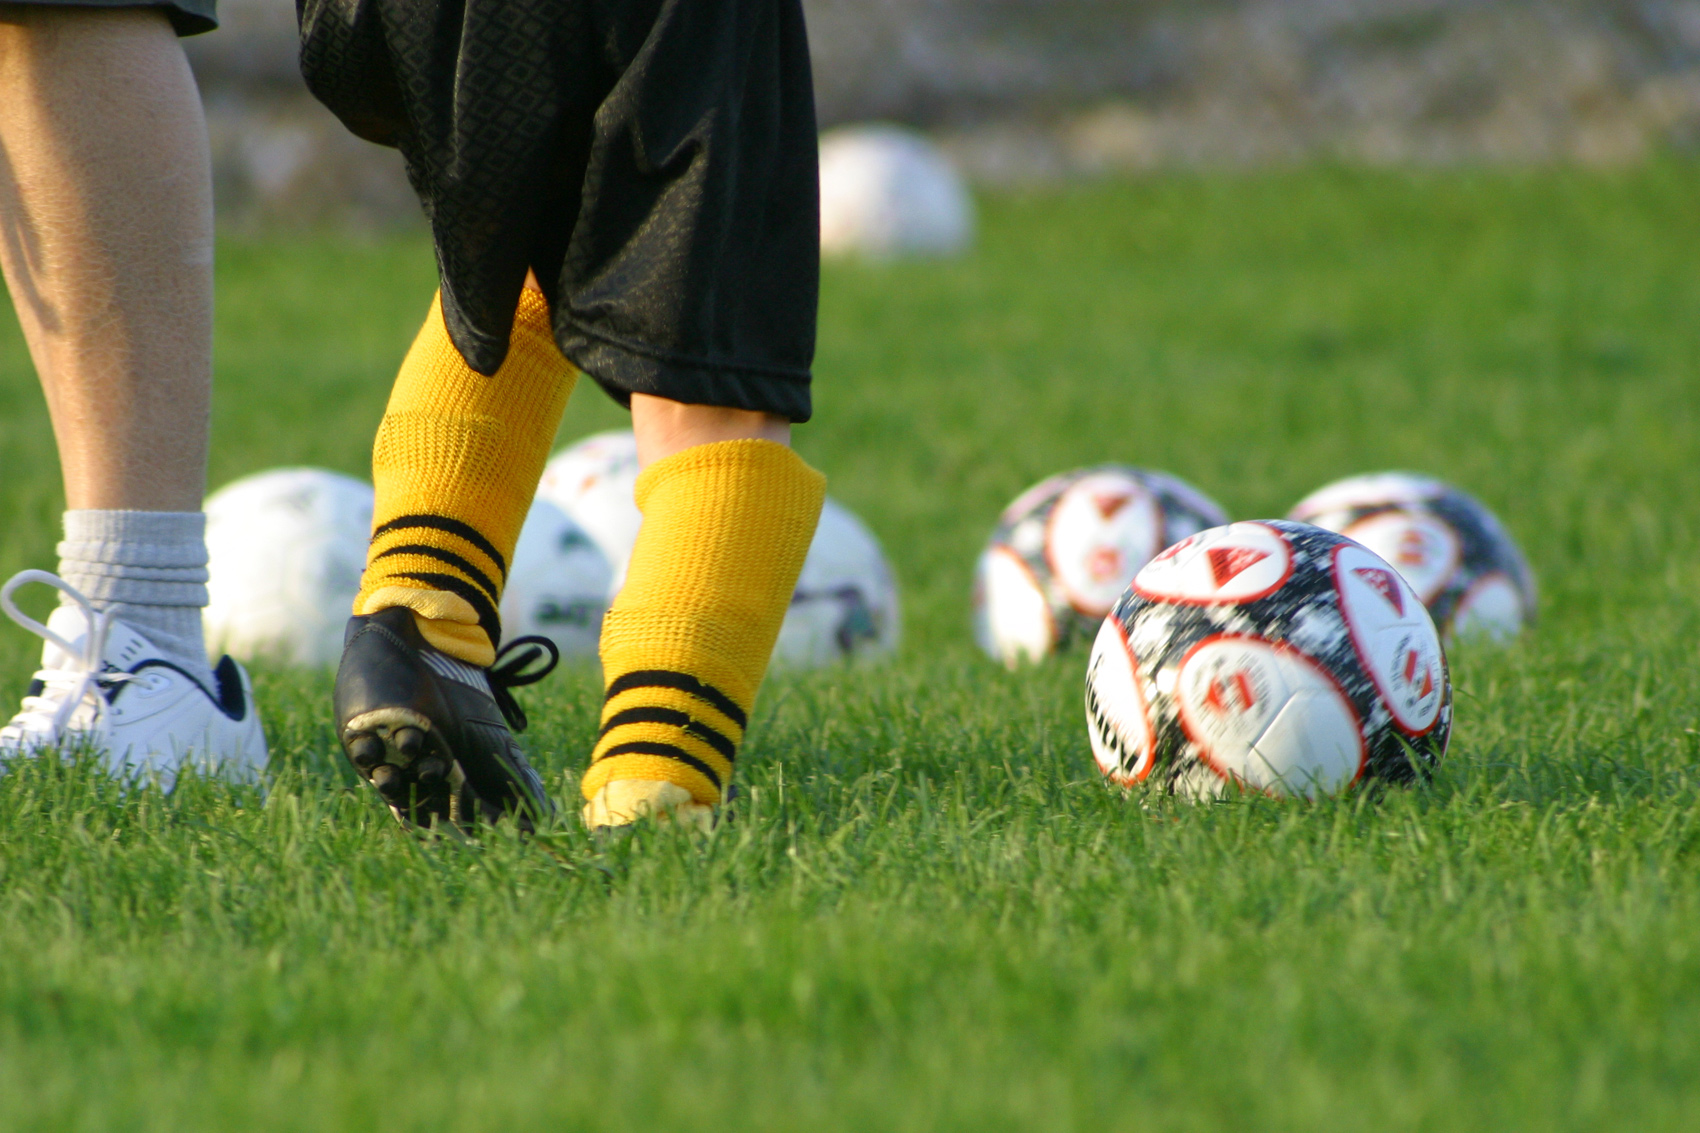 IFK Mariehamn przegrywa z Kuopion Palloseura (Kups)